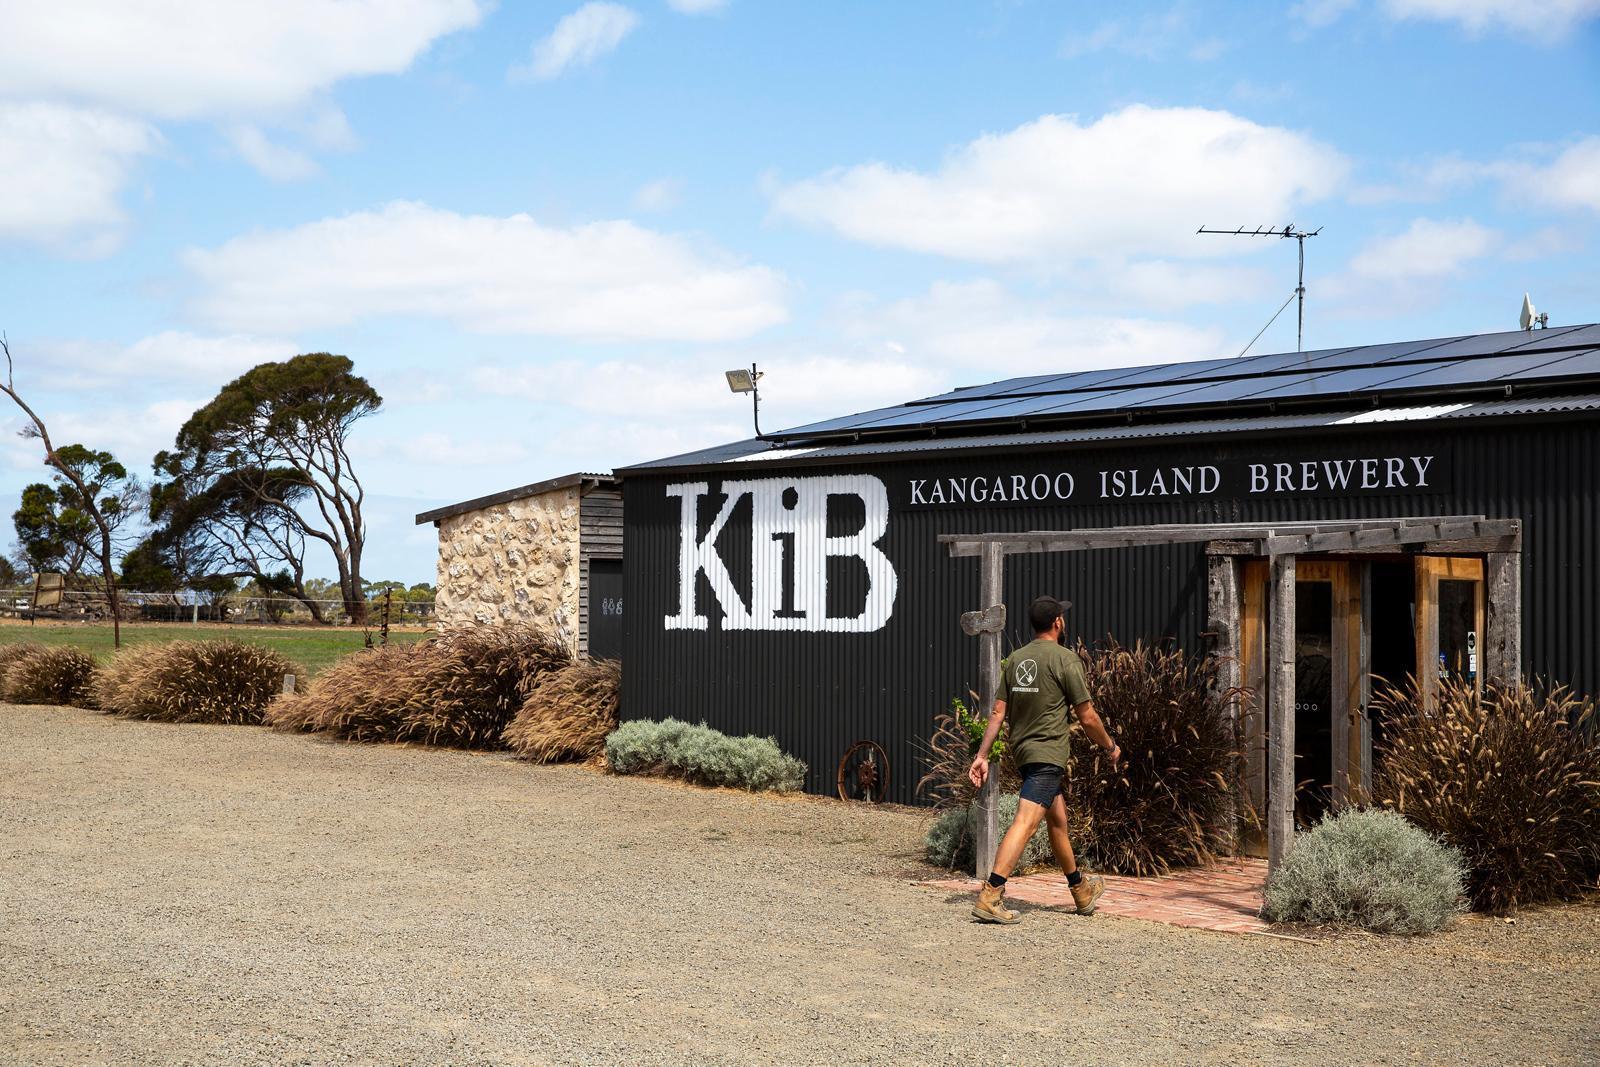 Kangaroo Island Brewery